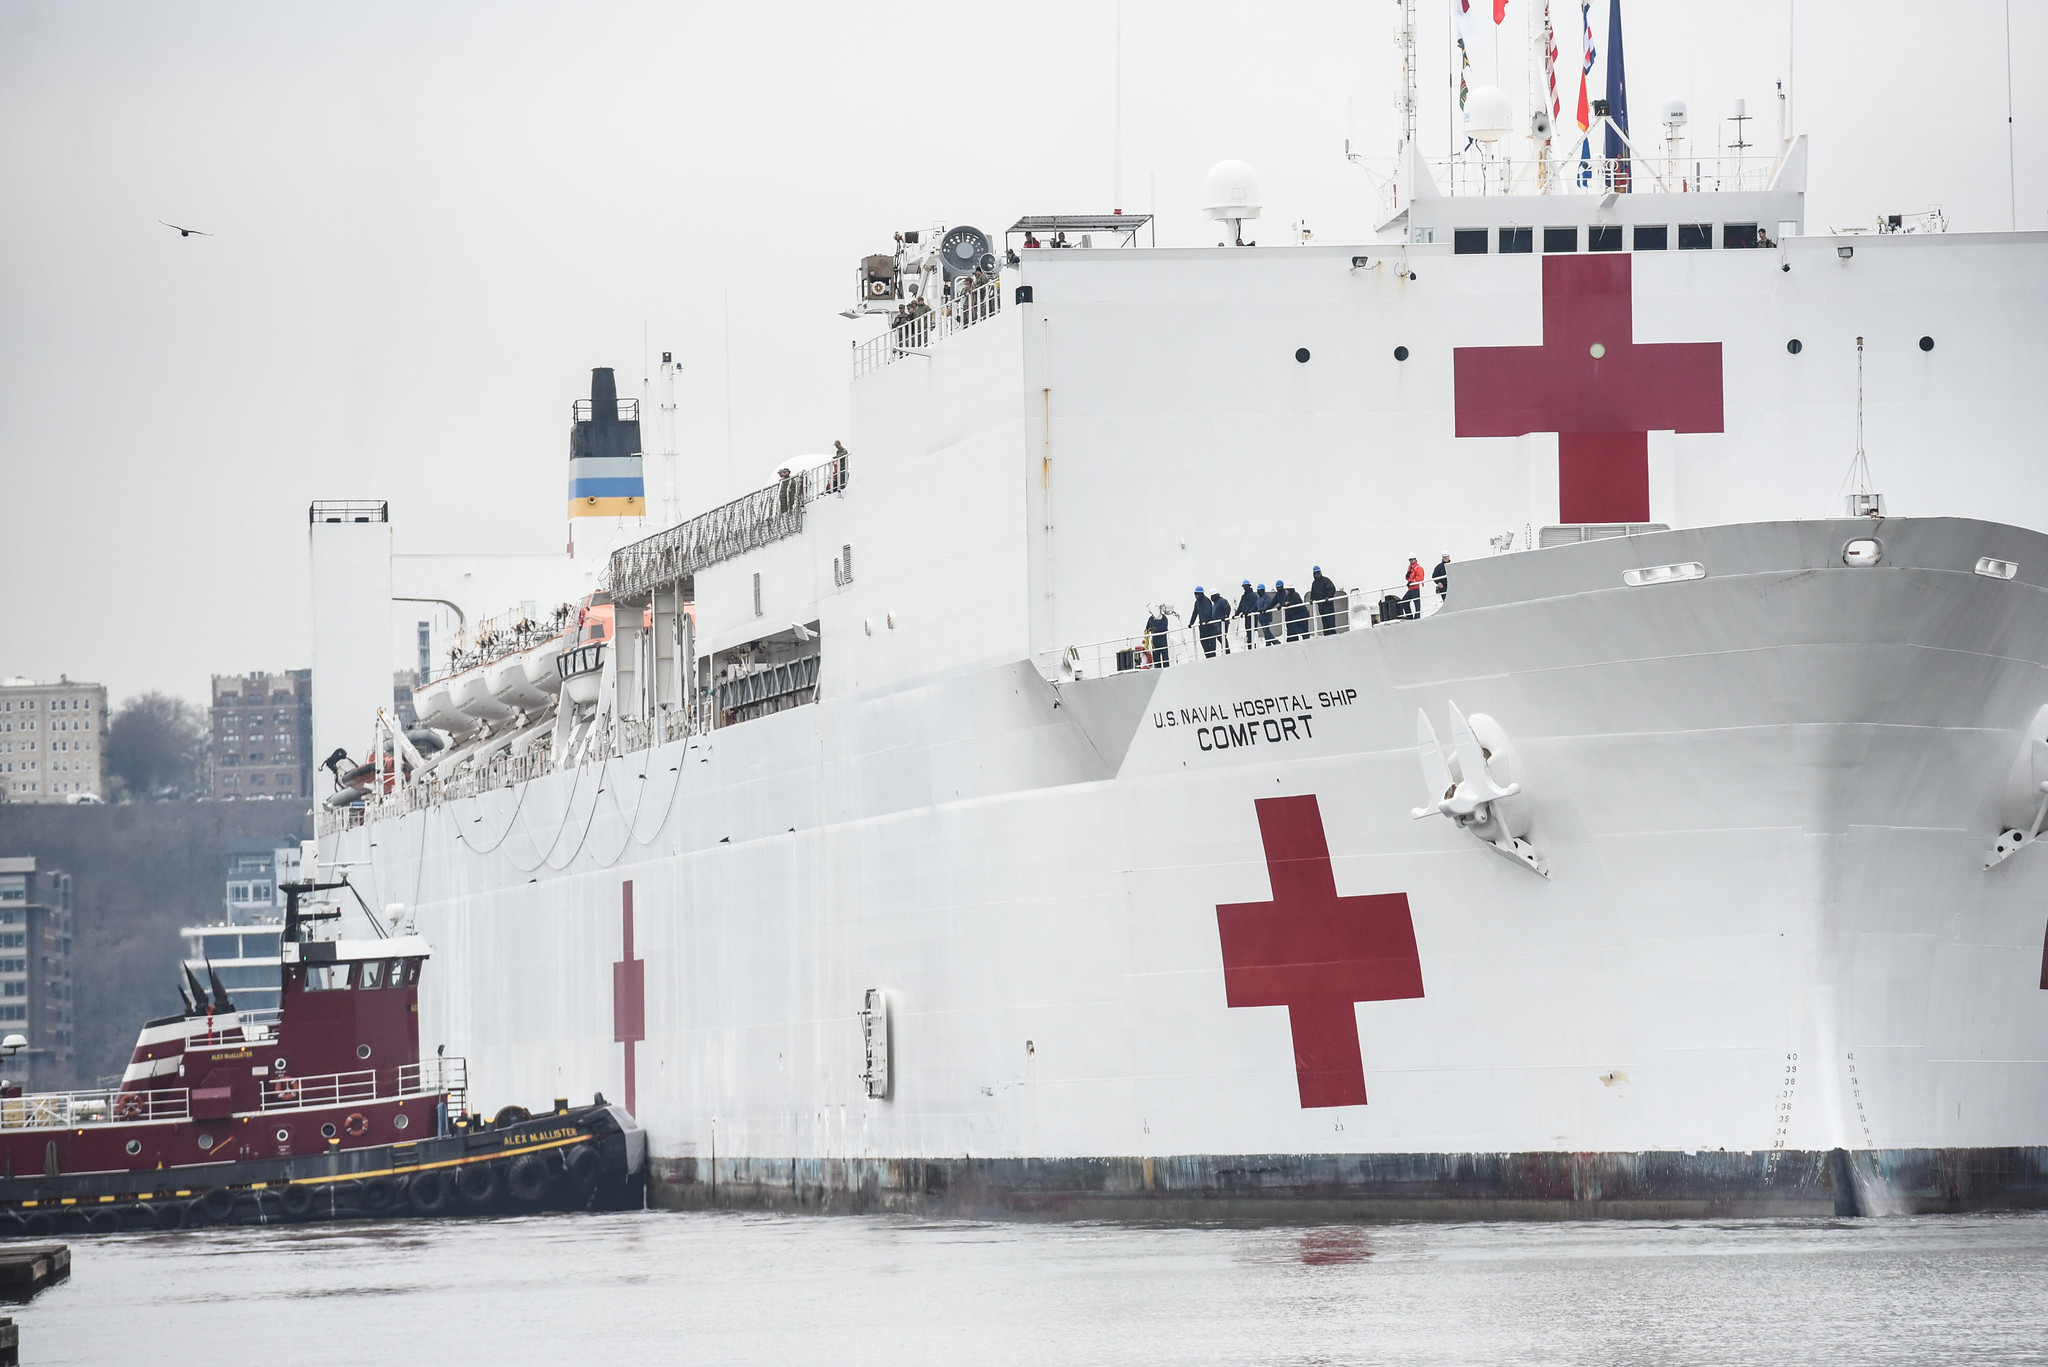 NY  greets hospital ship with cheers; California cases soar